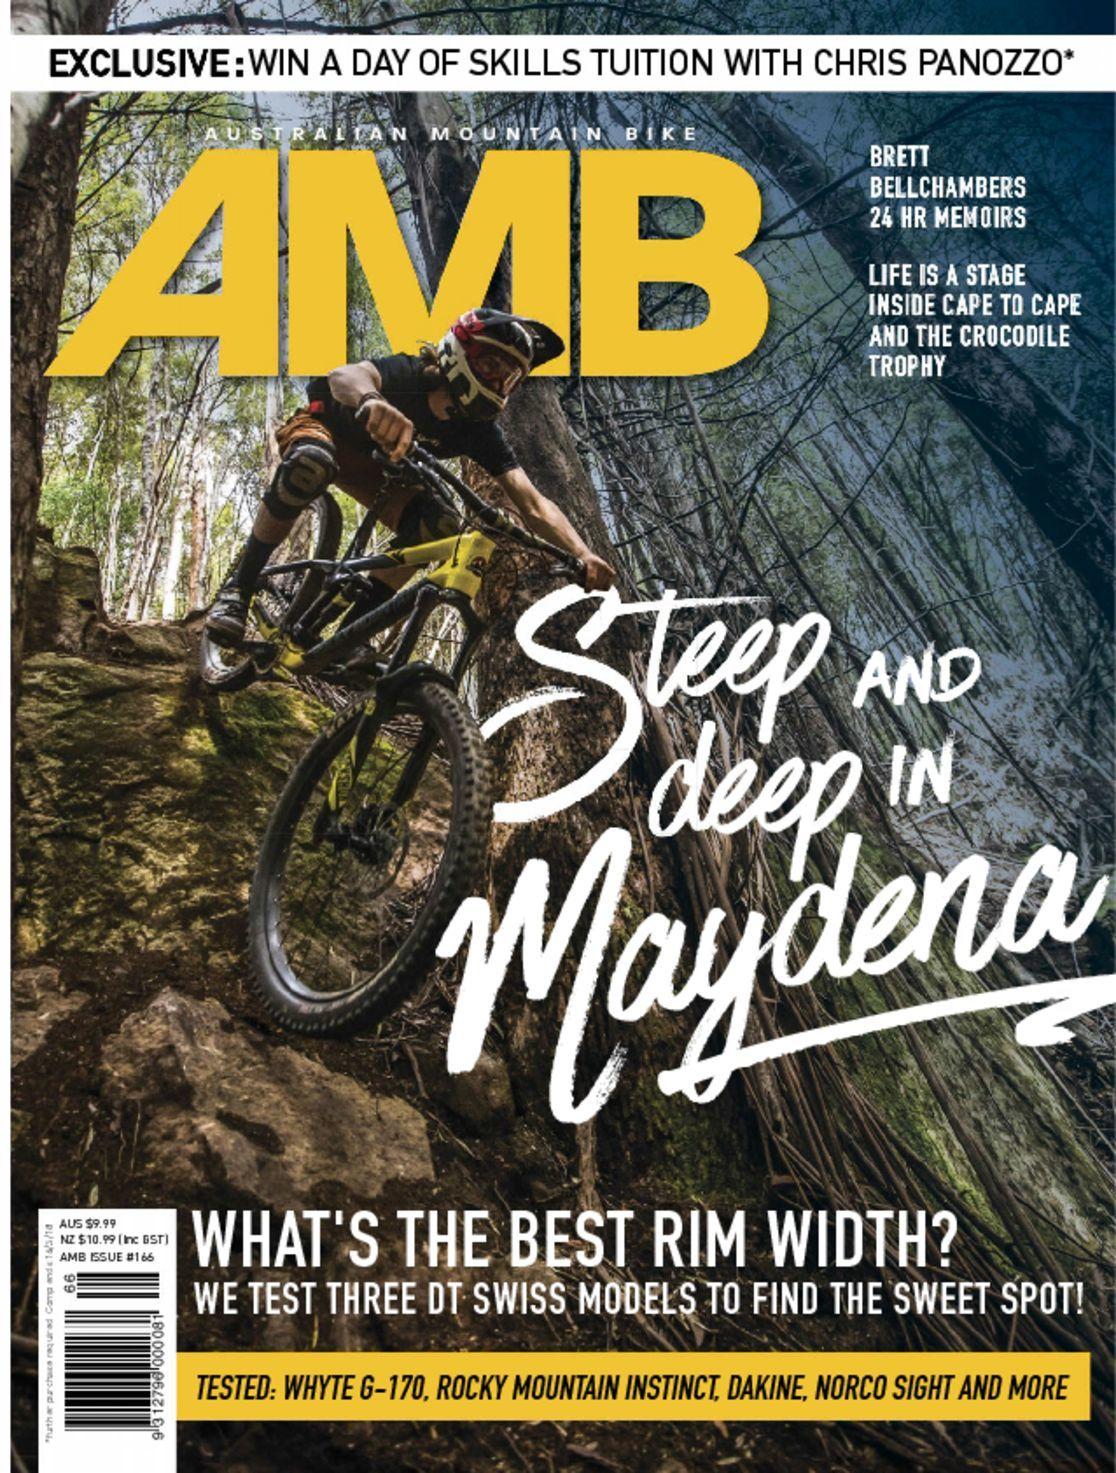 Australian Mountain Bike Digital